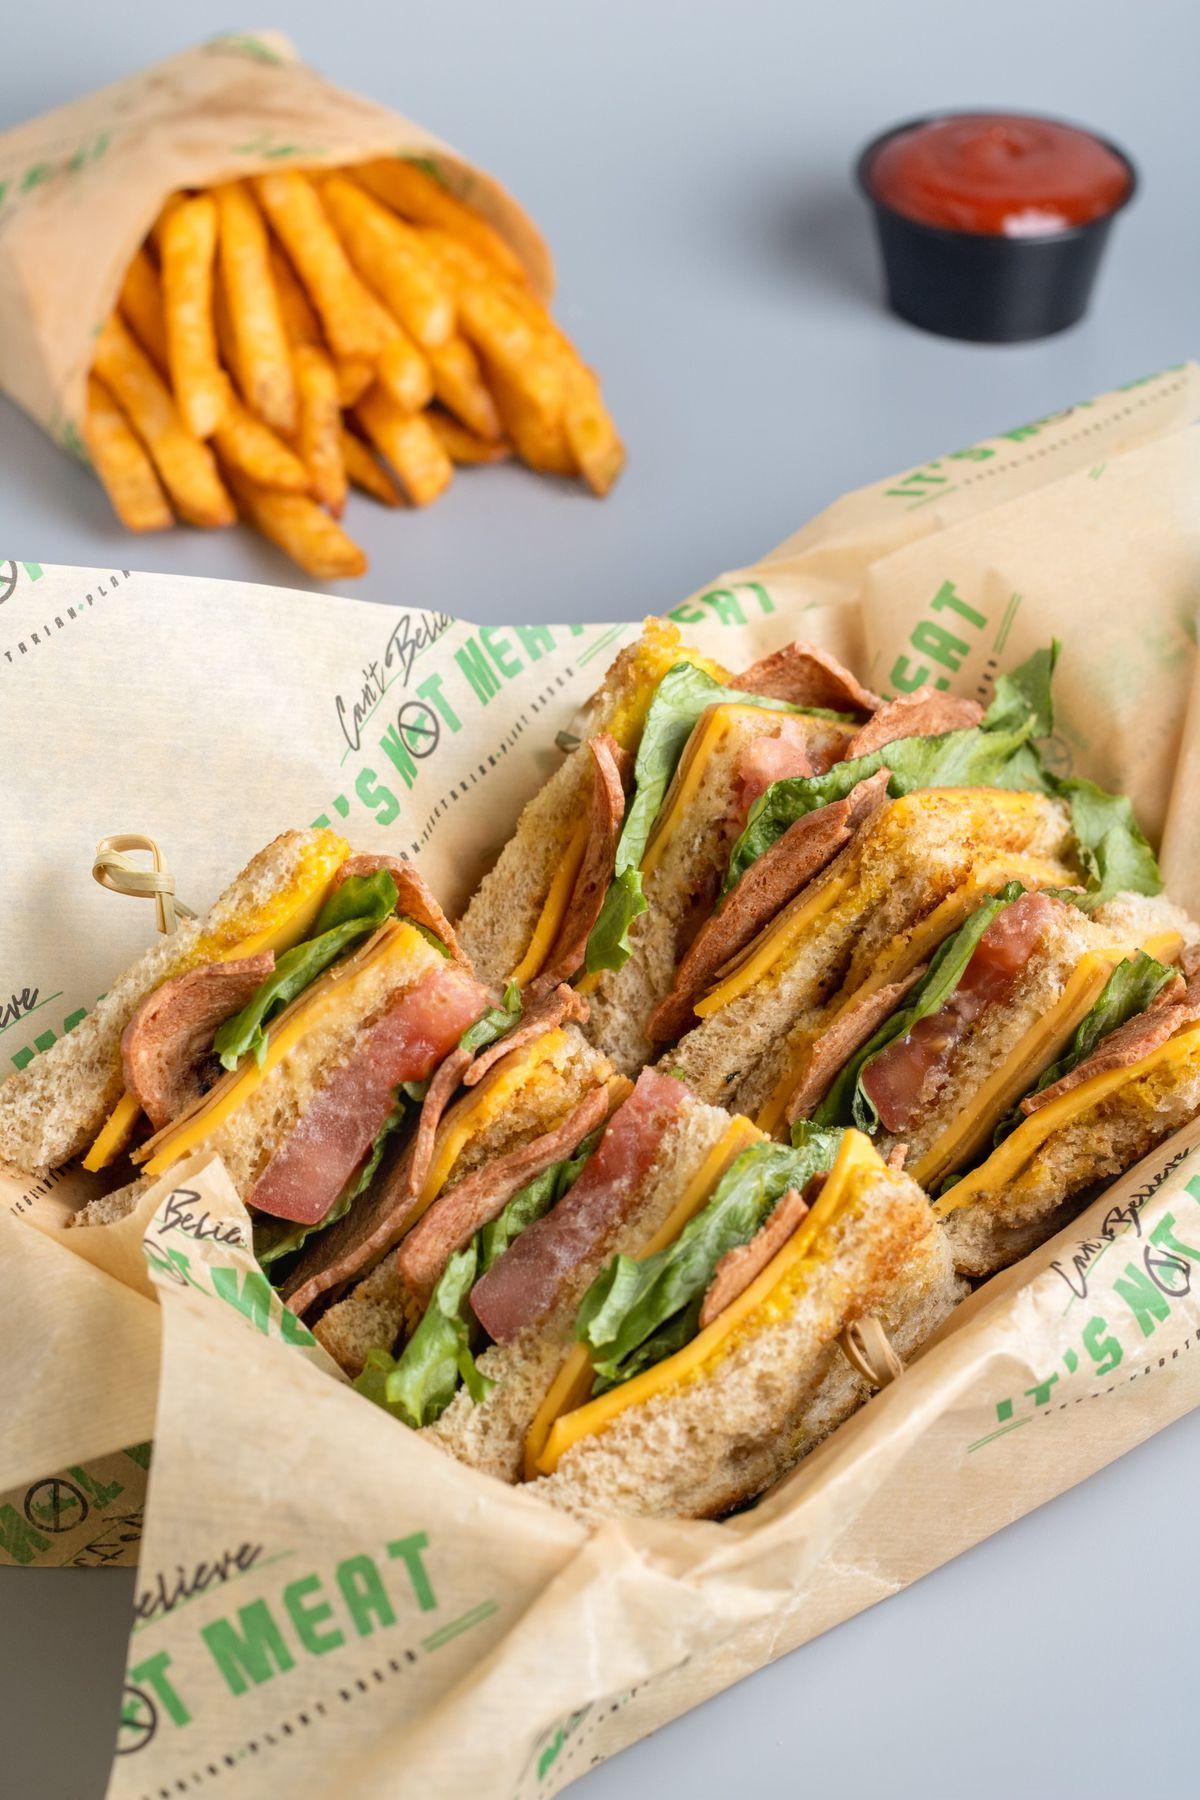 A vegan triple-decker club sandwich